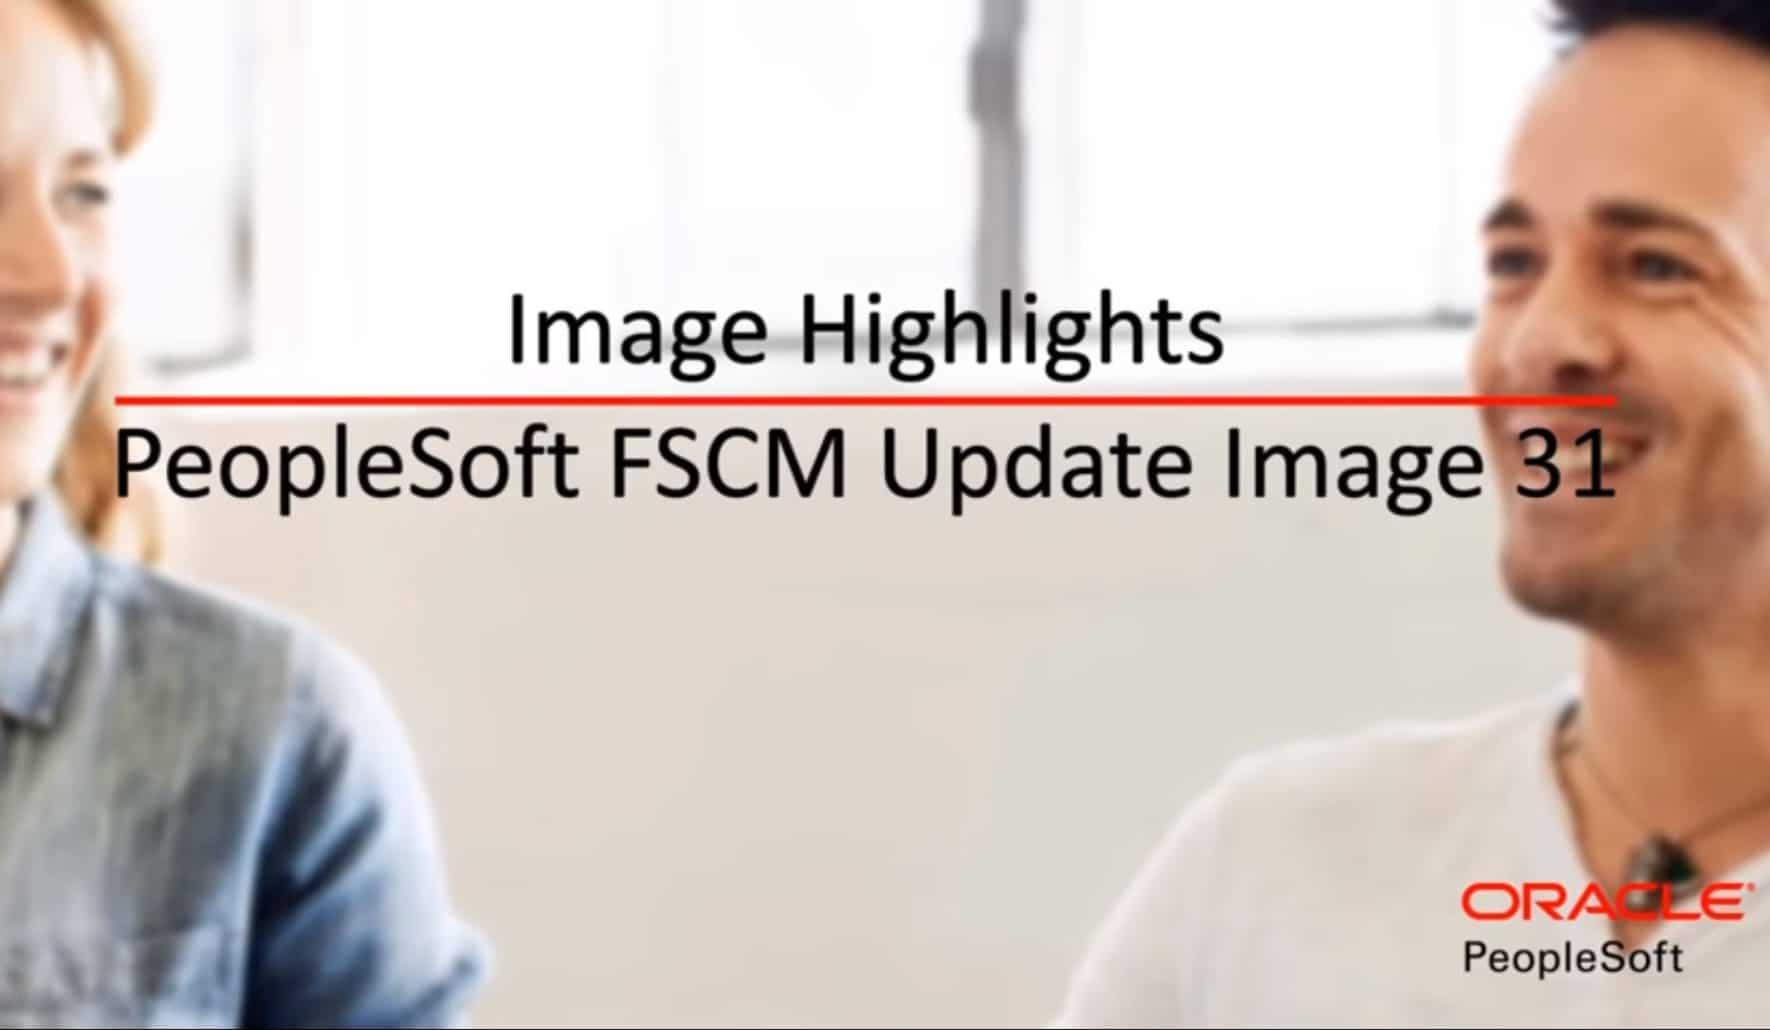 PSFT-FSCM-Image-31